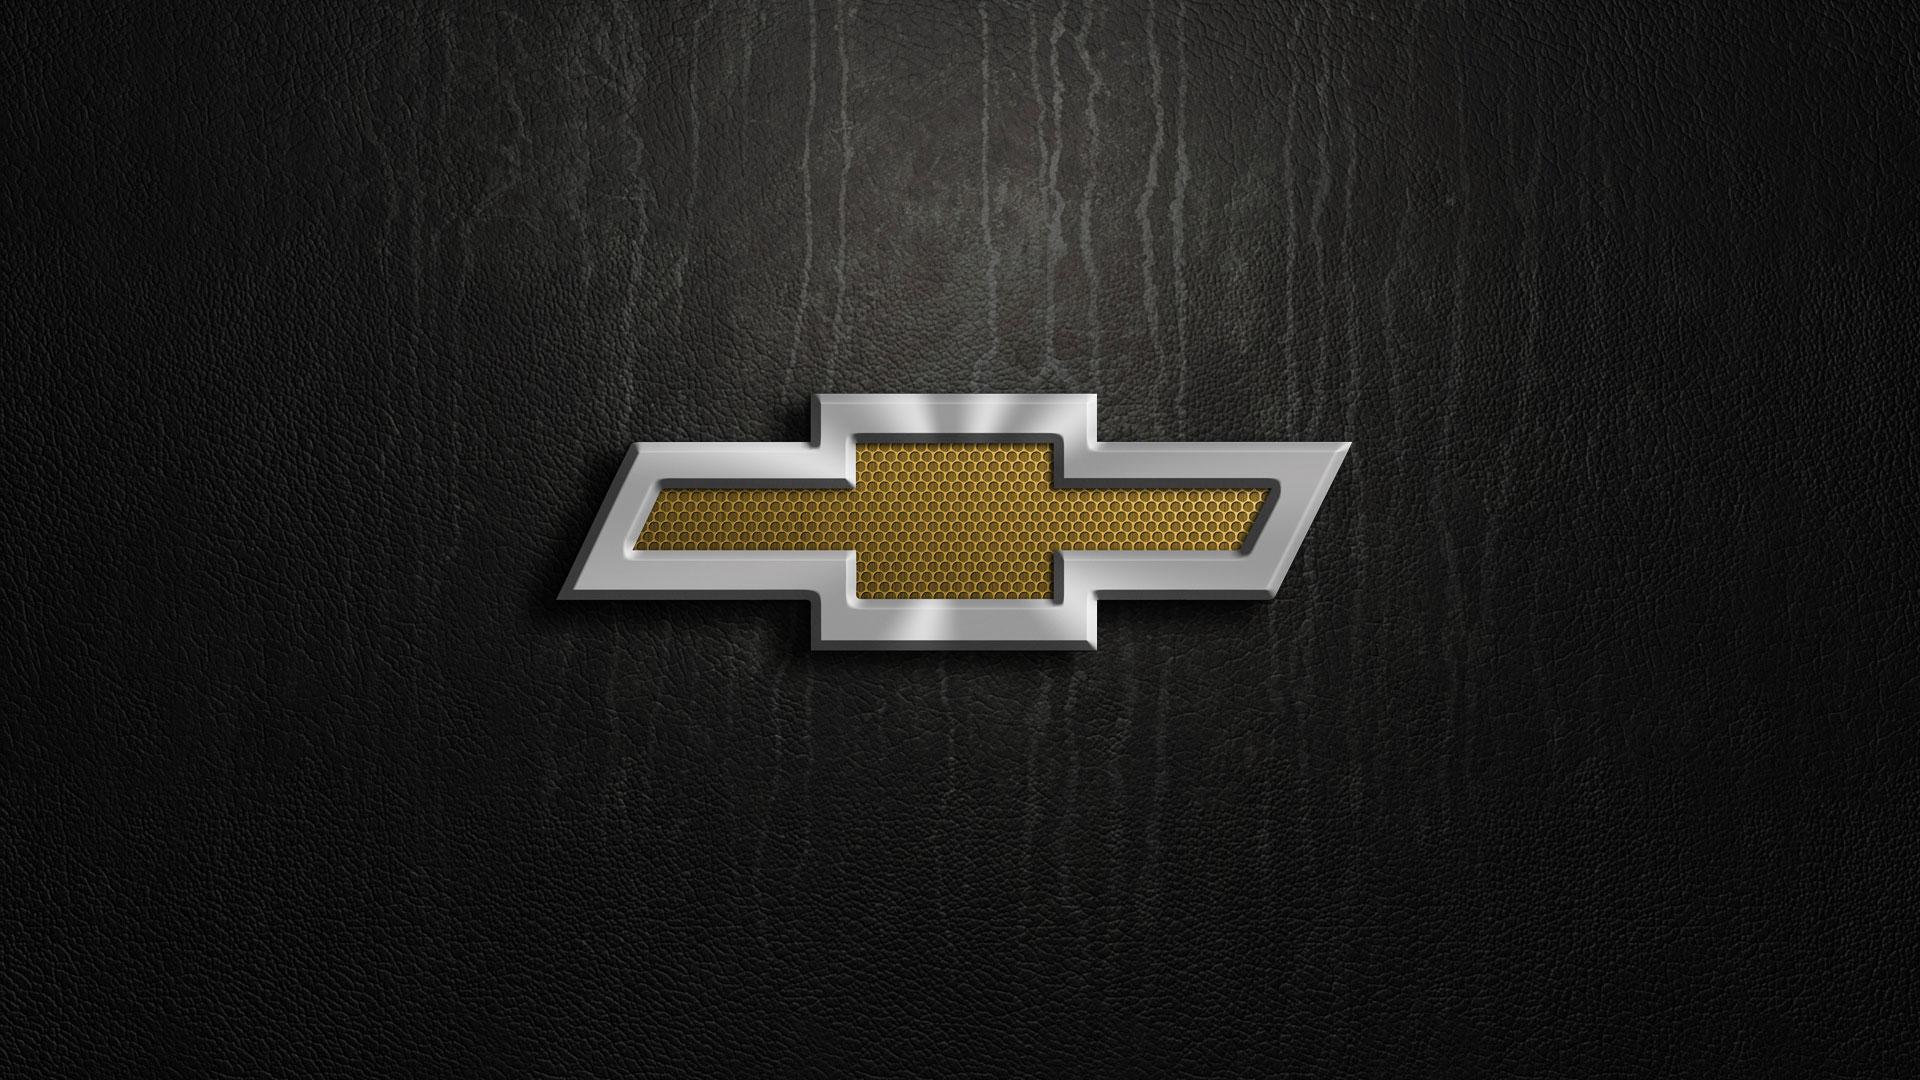 Chevy Logo Backgrounds Logo wallpaper 7498 1920x1080